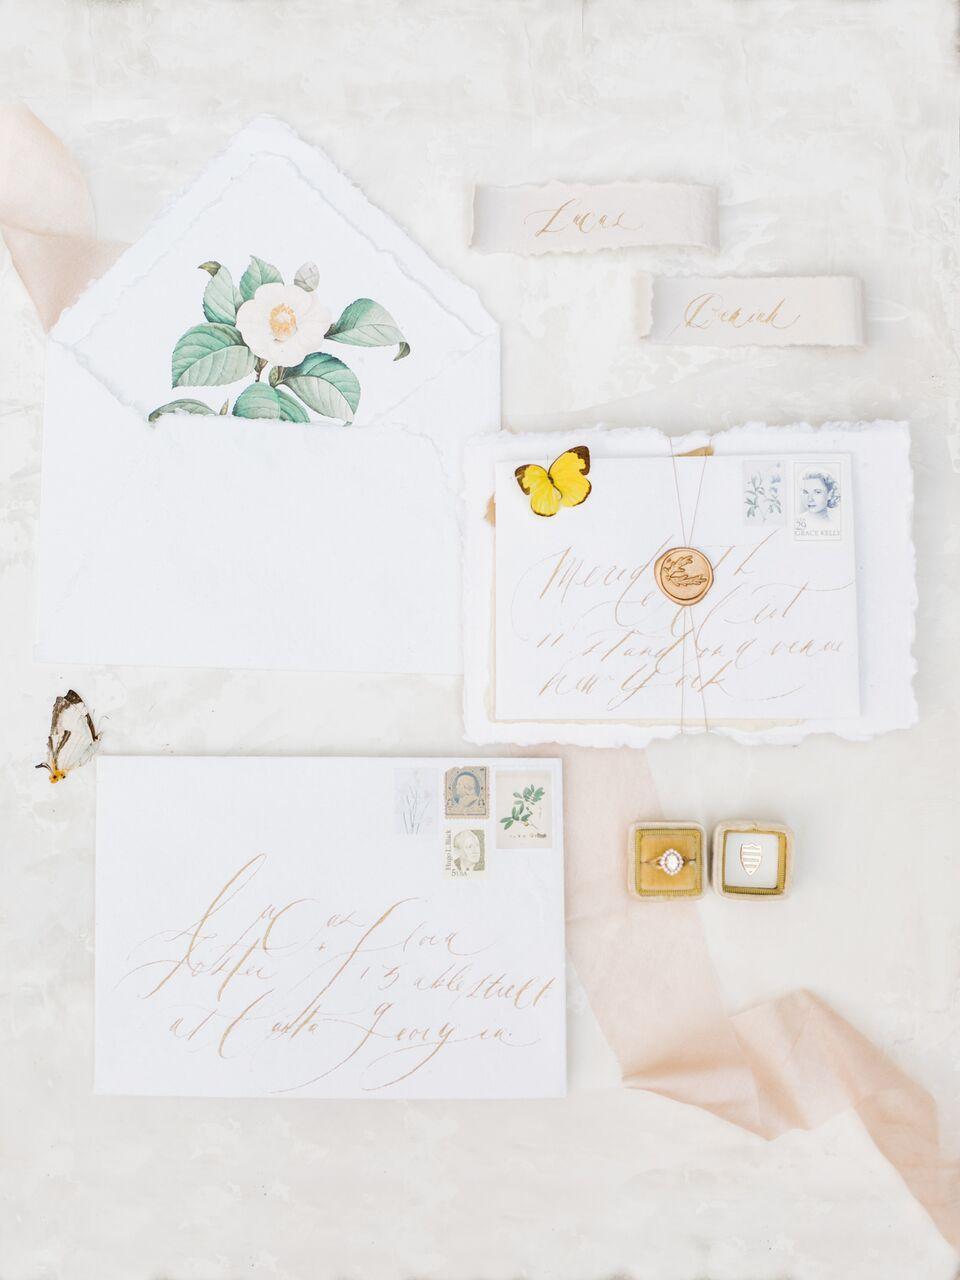 vintage invite with deckled edge paper and envelope illustration